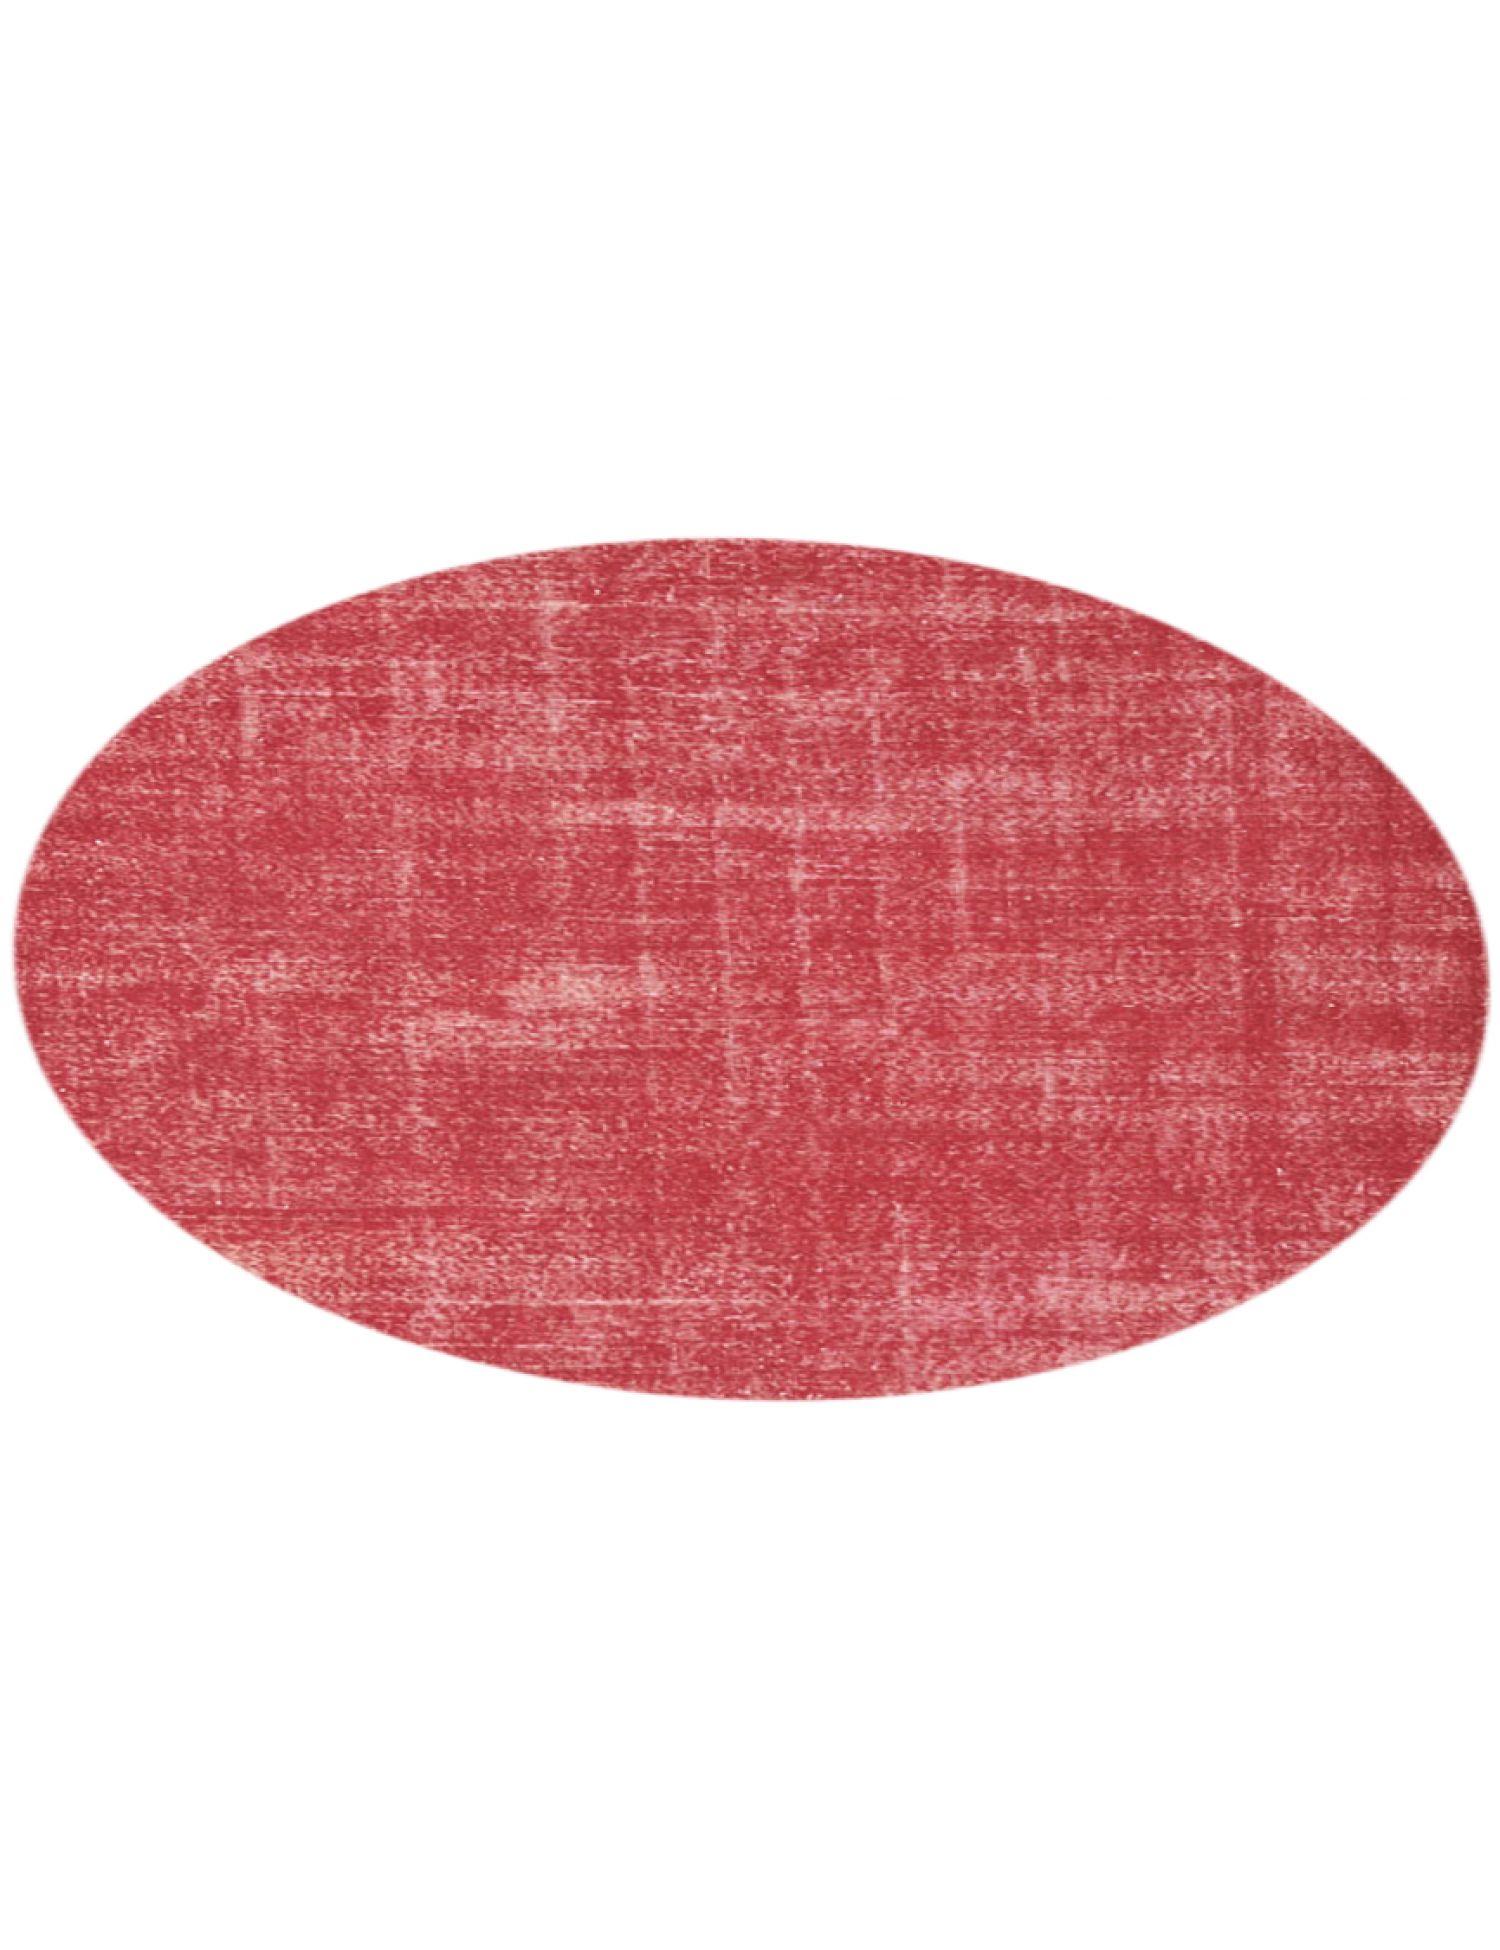 Tappeto Vintage  rosso <br/>217 x 217 cm